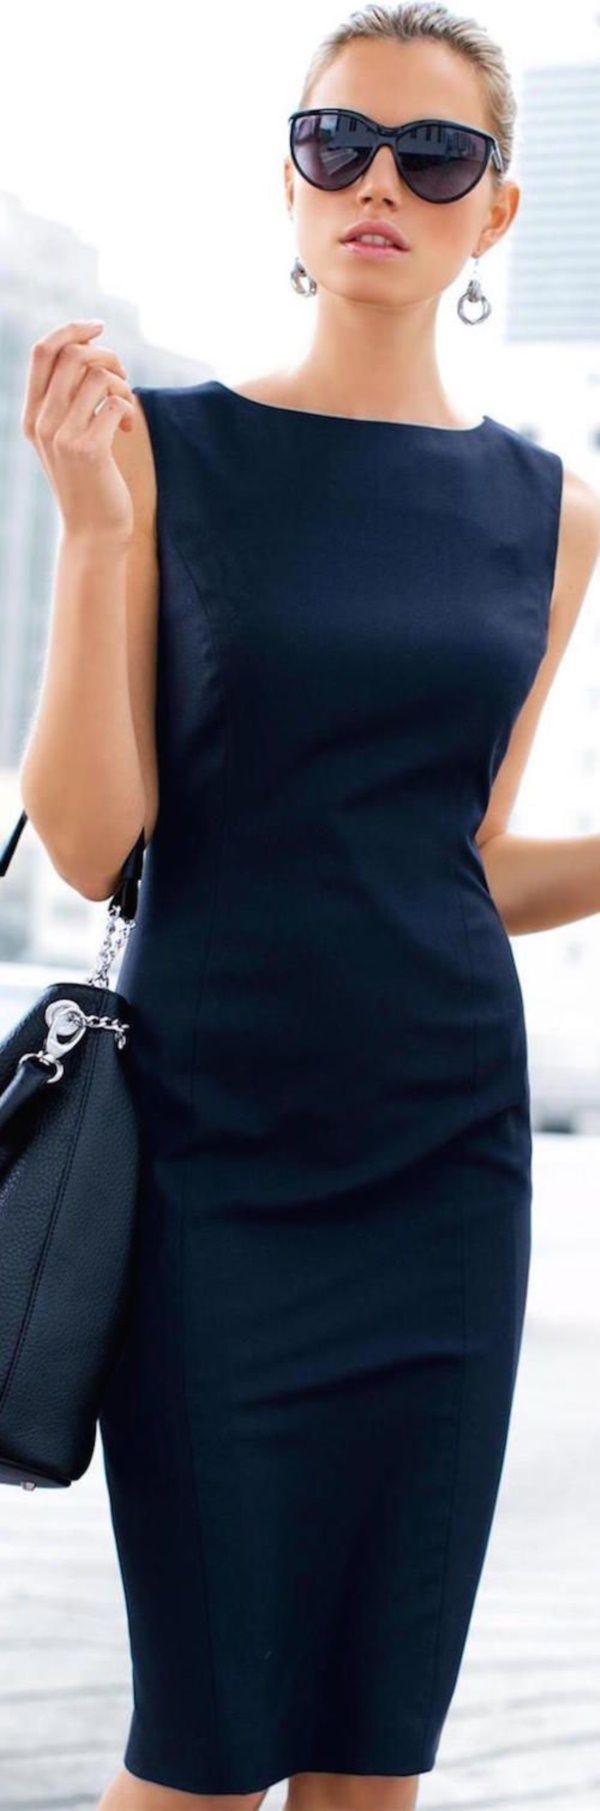 205da6363e5d235970e1da329e40d0f4 women fashion trends 50+ best outfits